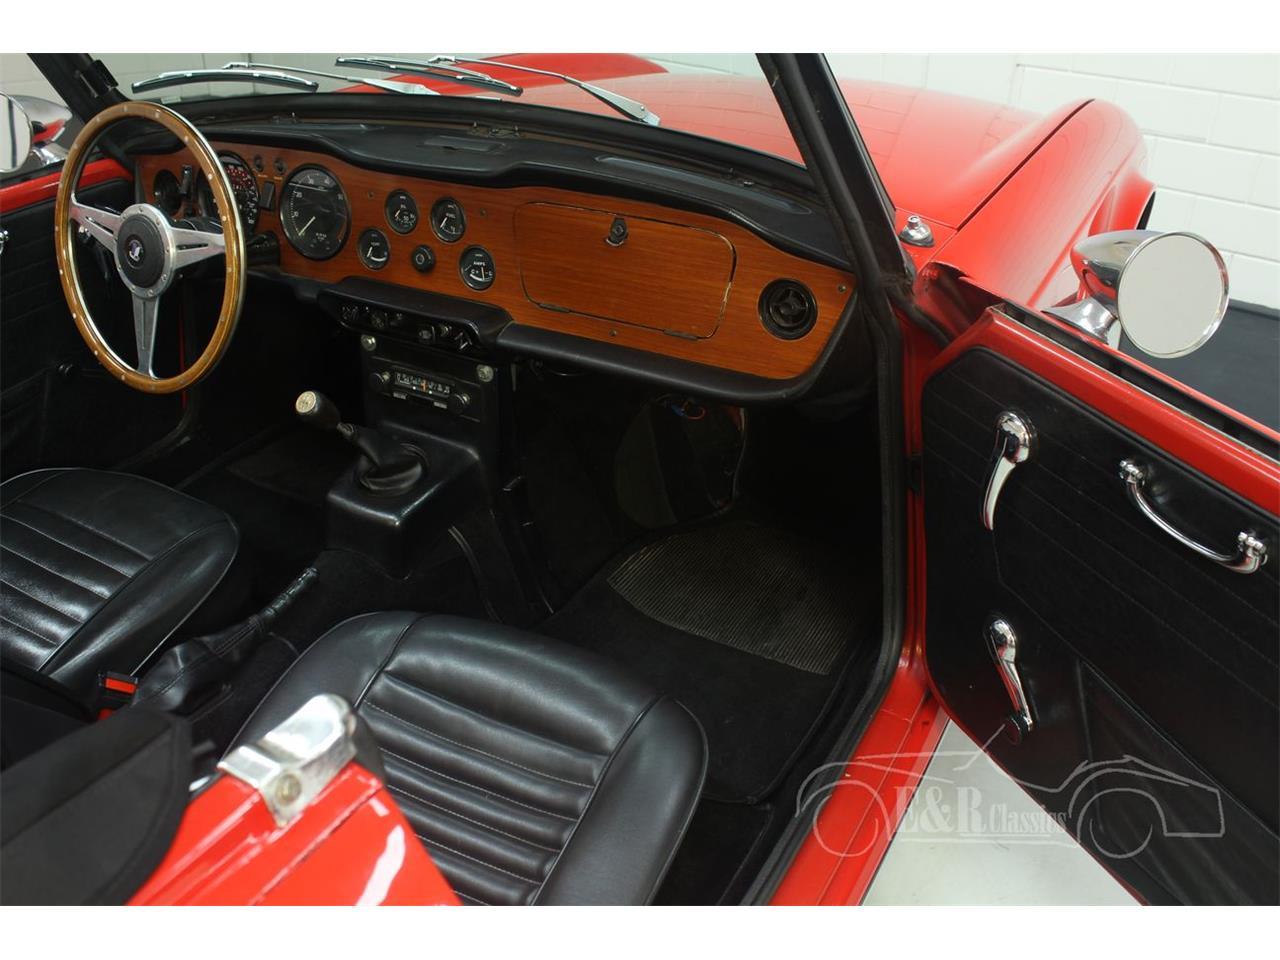 1971 Triumph TR6 (CC-1293543) for sale in Waalwijk, Noord-Brabant